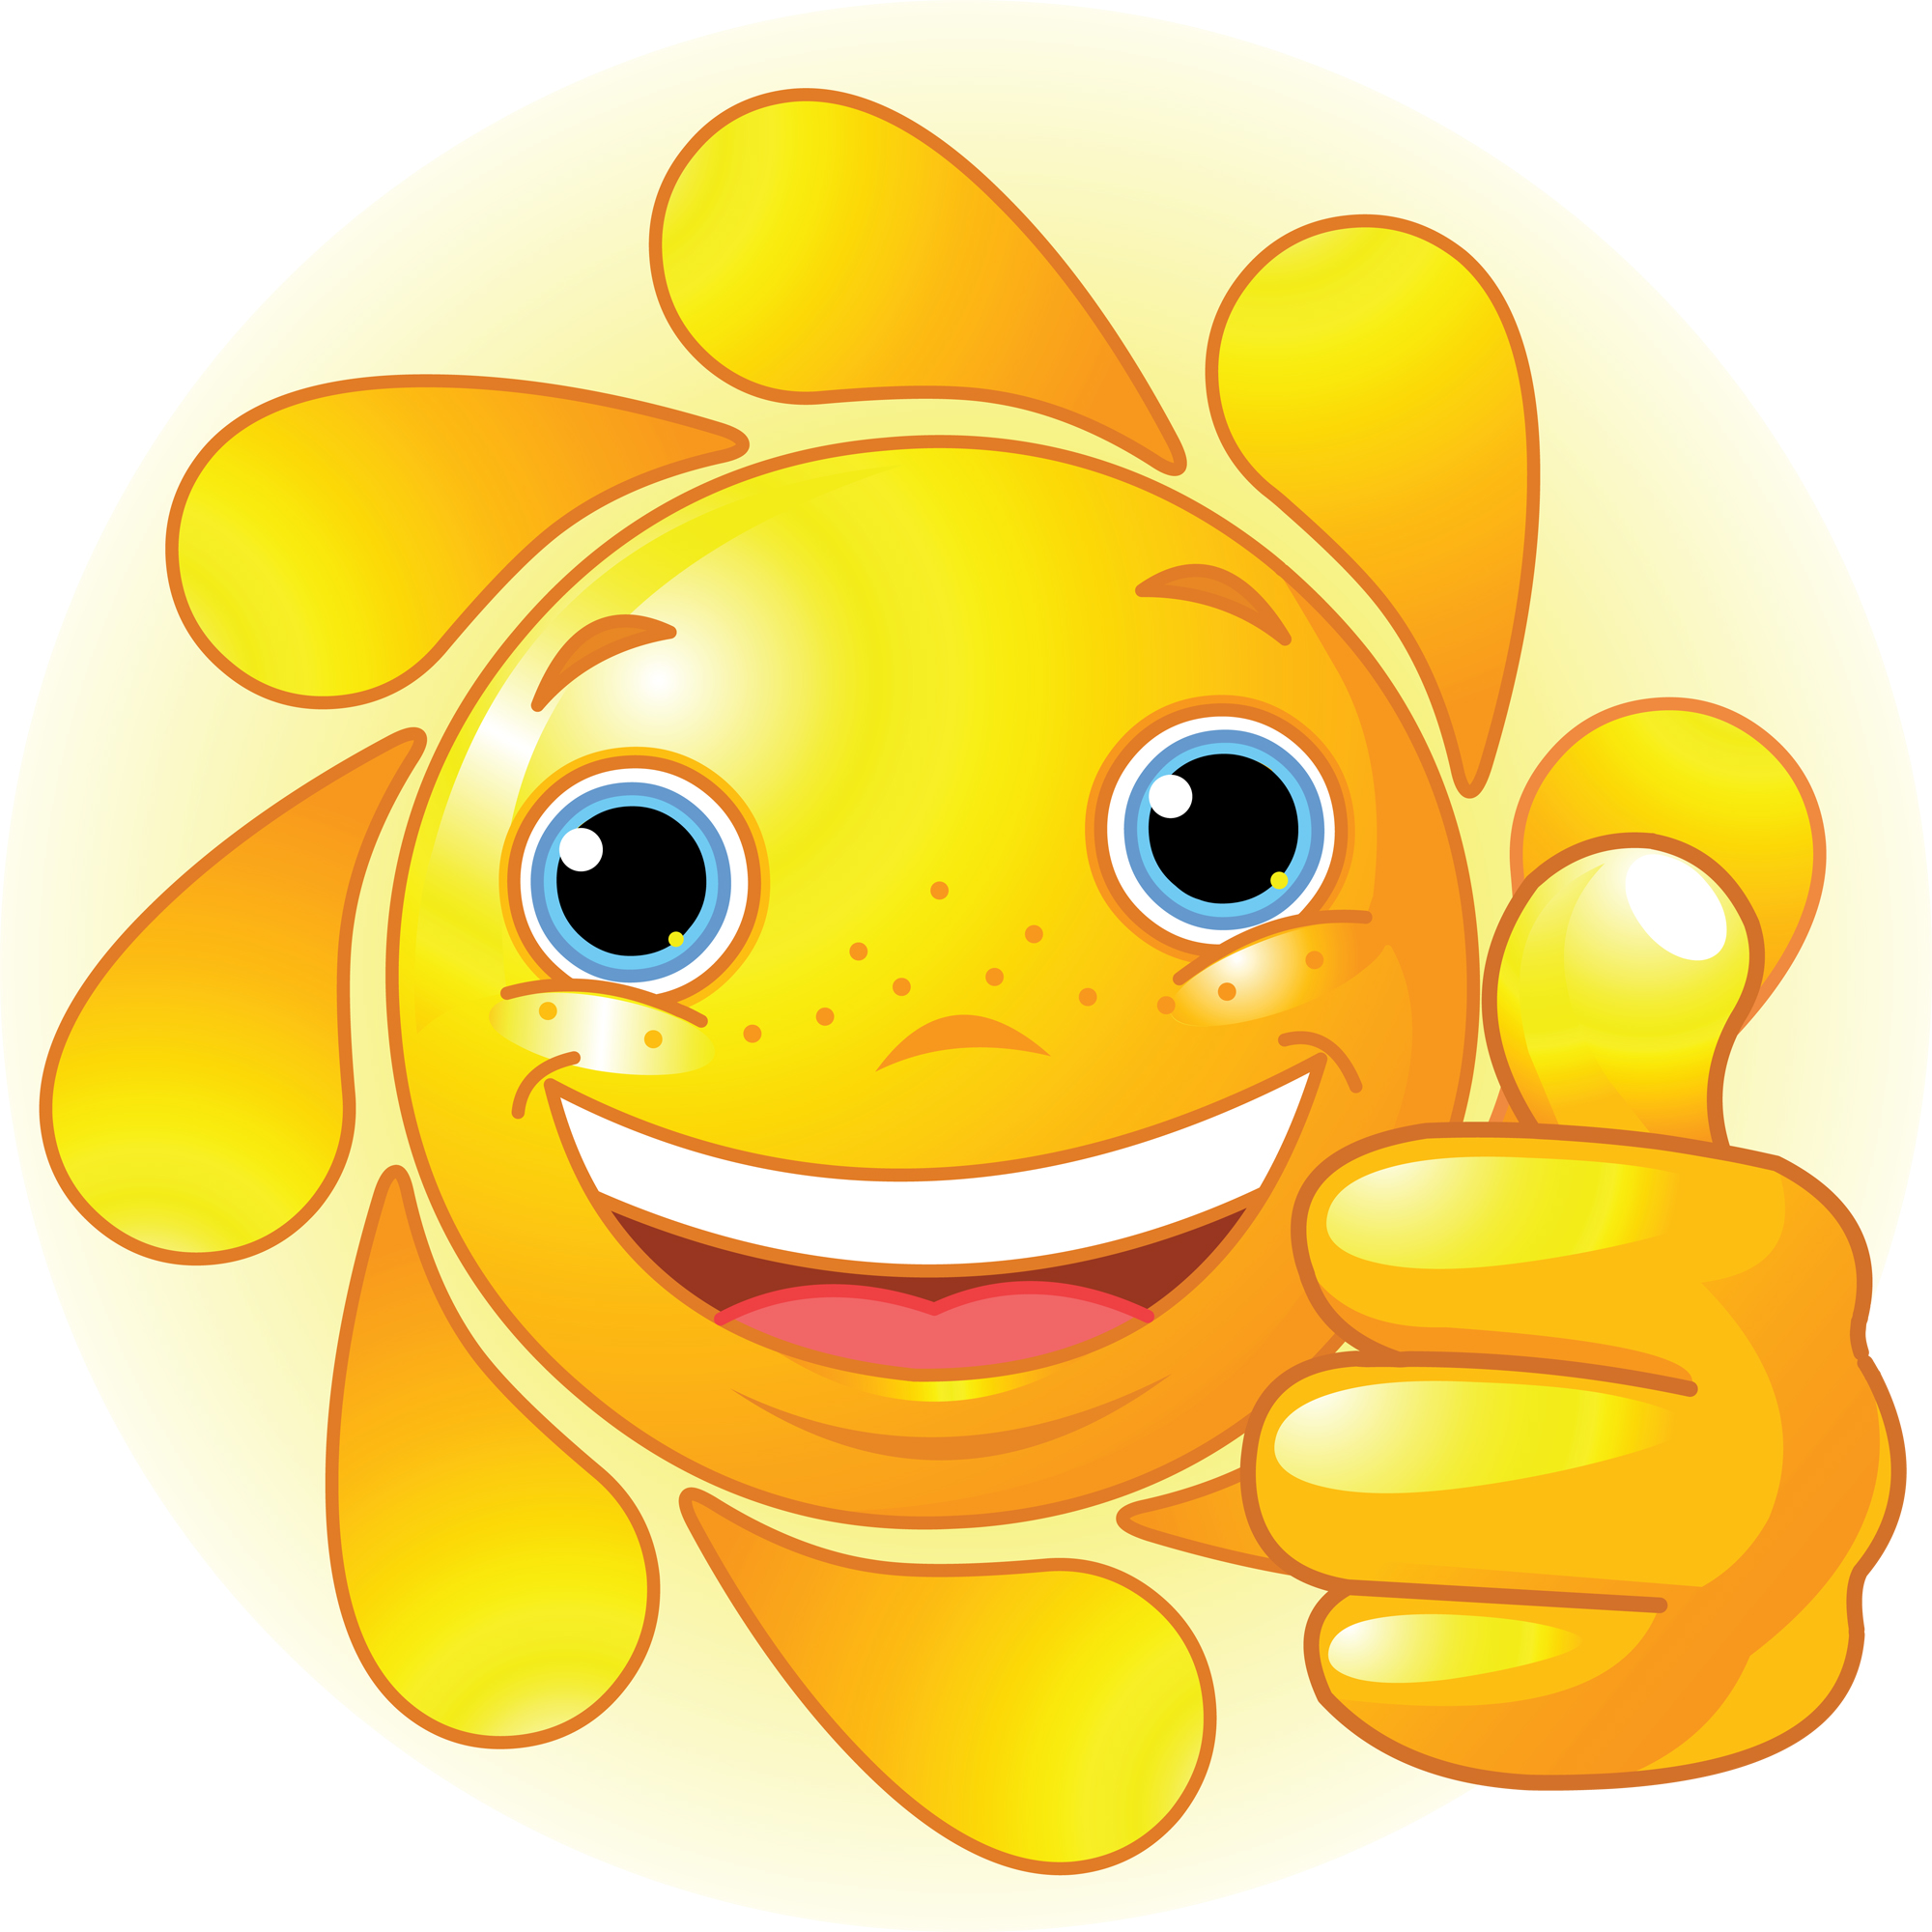 2000x2000 Clip Art Smiling Sun Clipart